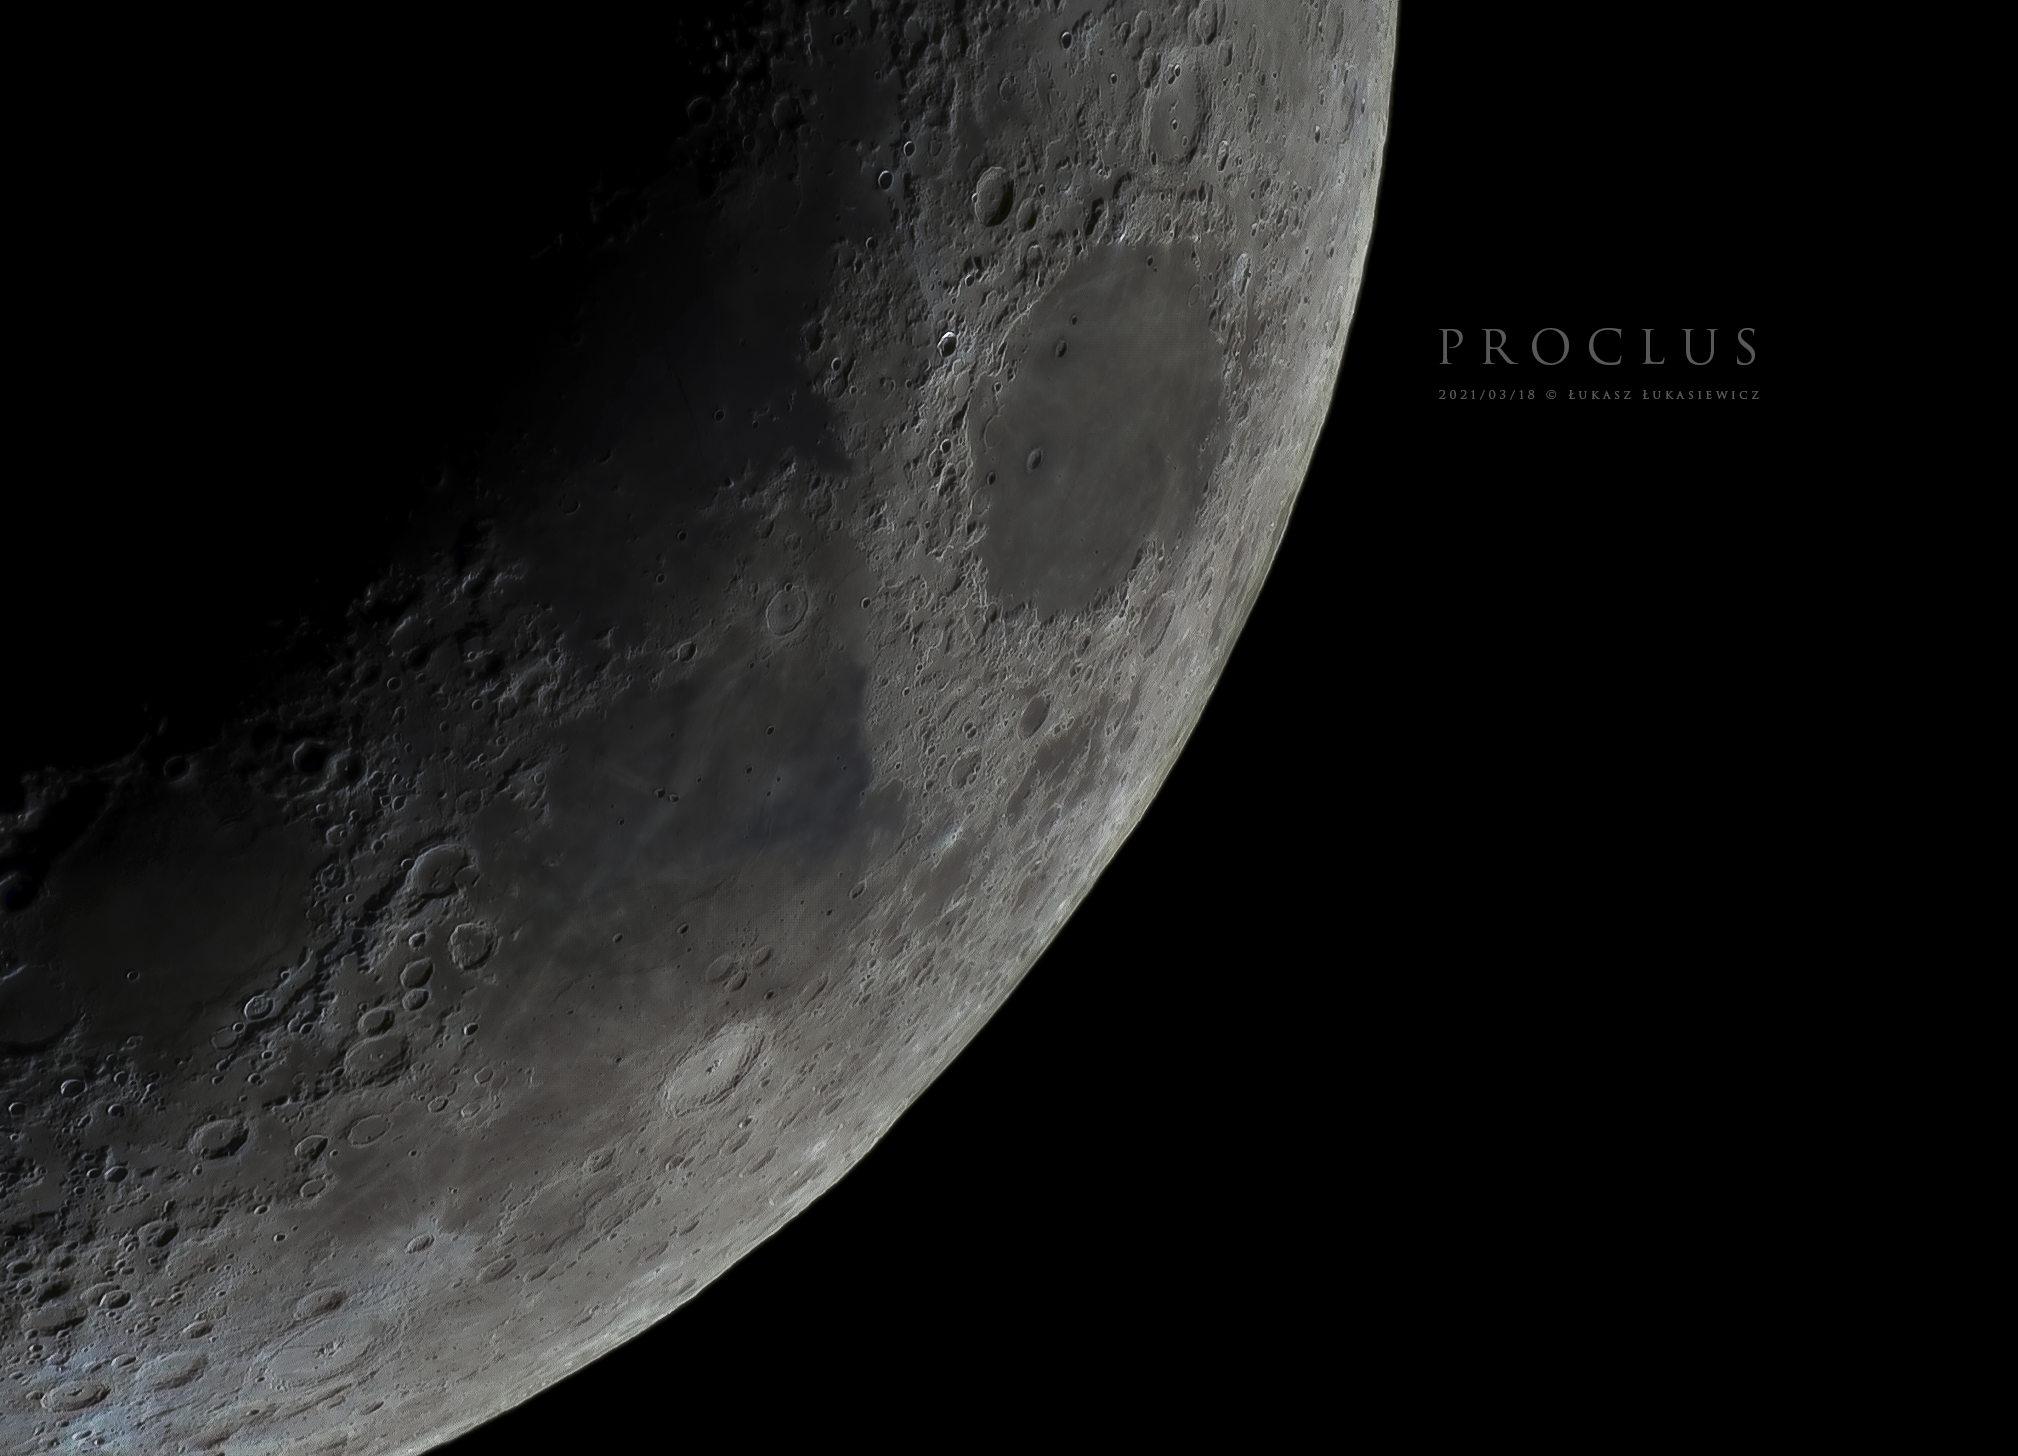 PROCLUS 2021-03-18